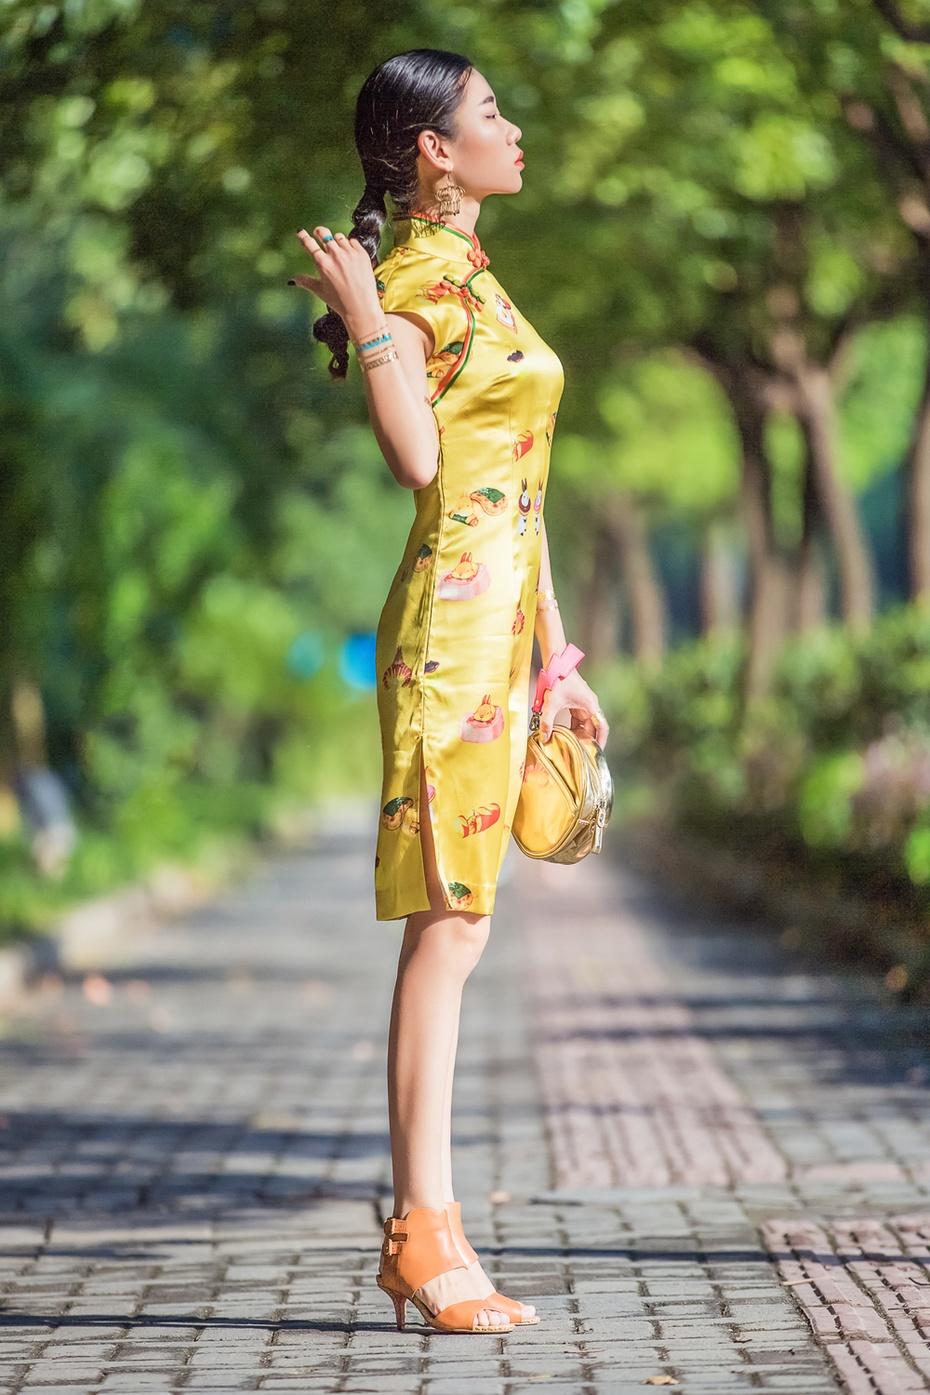 [Ava搭配日记]阳光与灿金 - AvaFoo - Avas Fashion Blog